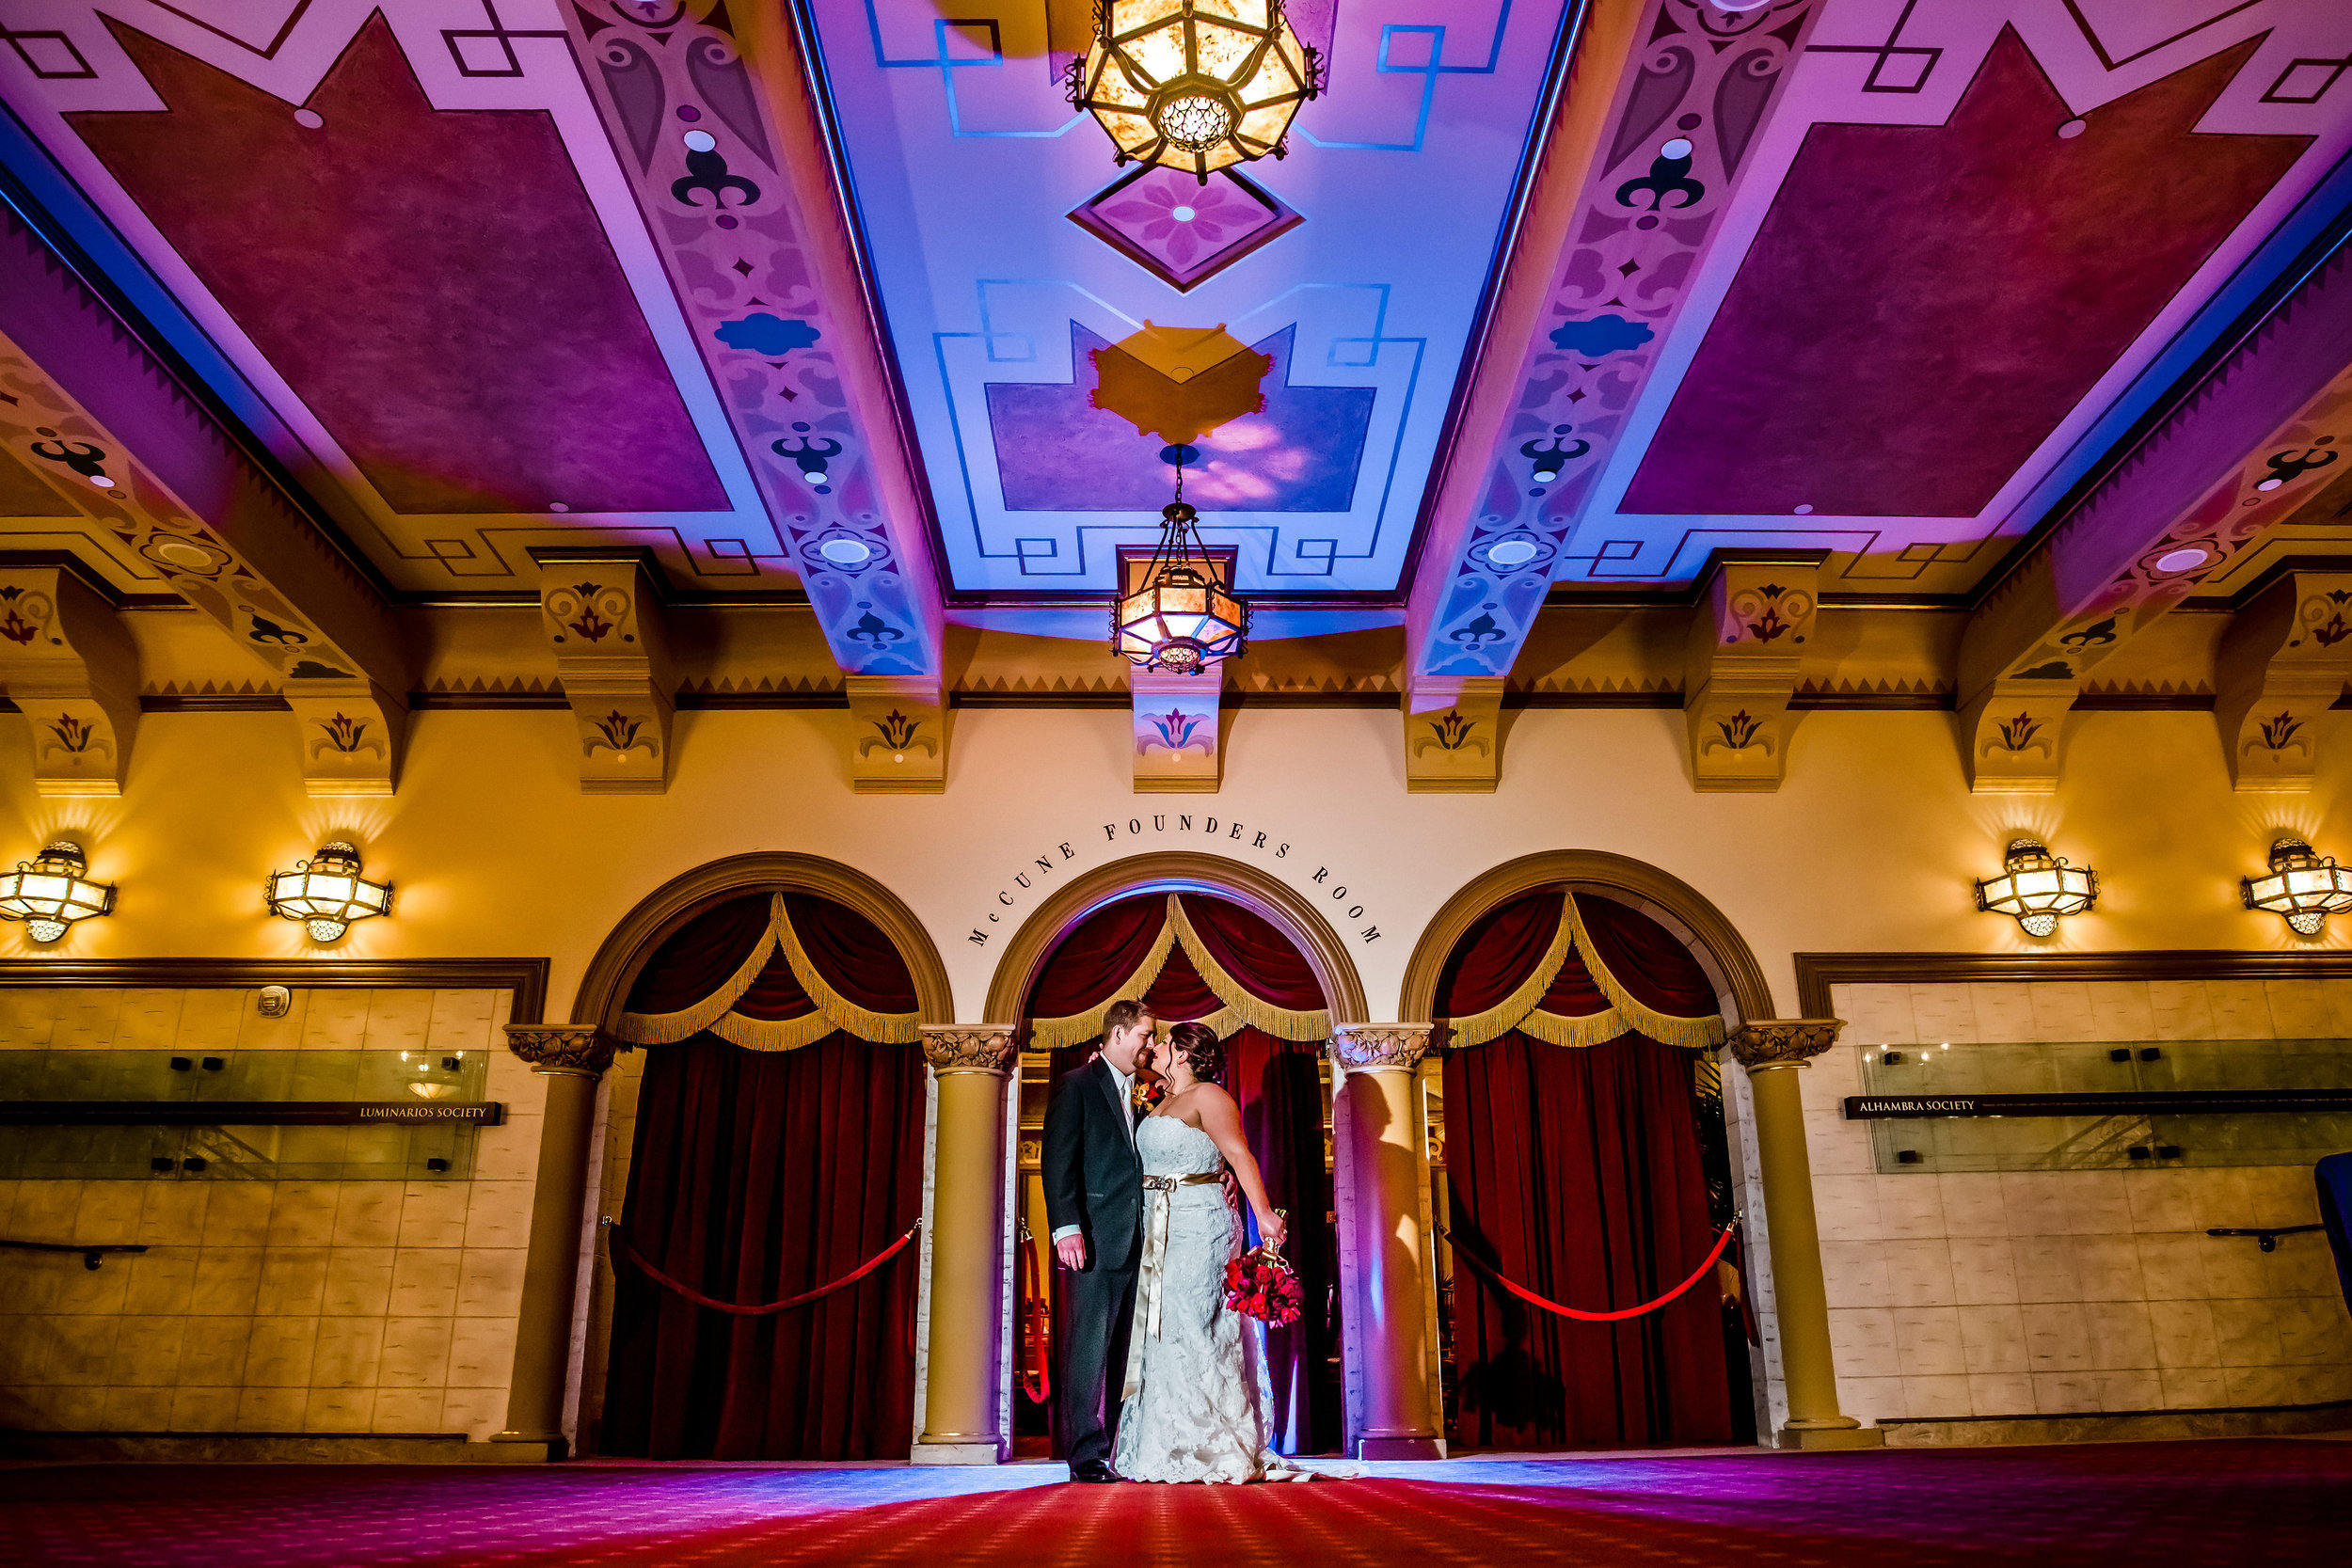 santabarbarawedding.com   The Granada Theatre   Theater Venue   Location Wedding Ceremony   Reception Venue   McCune Founders Room